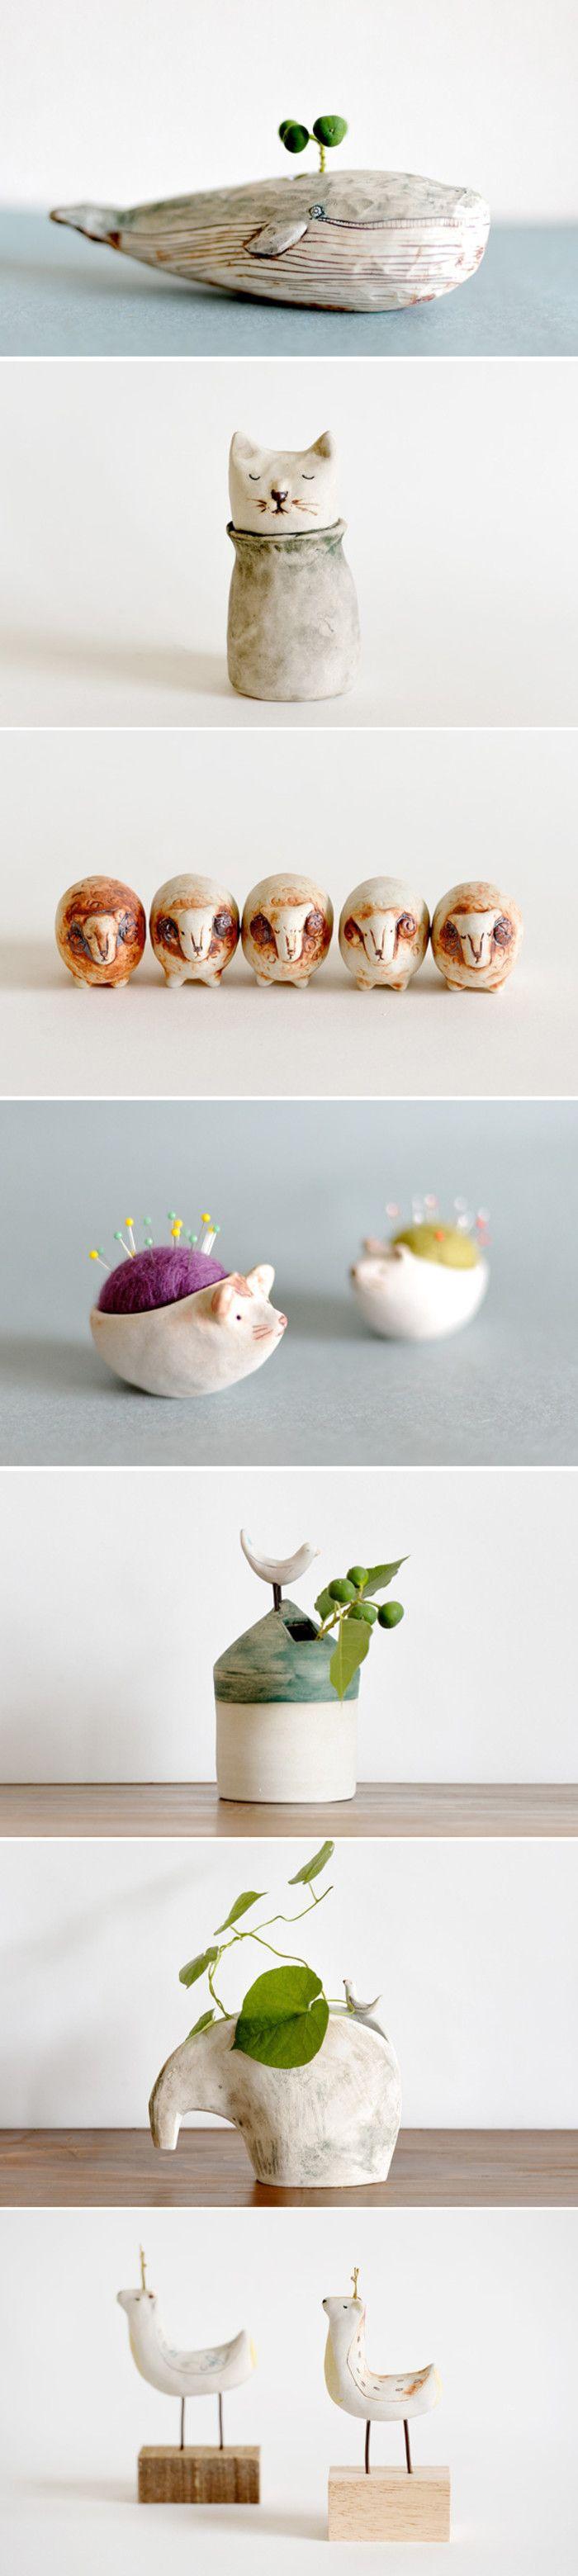 Japanese artist known gold Sato Megumi handmade ceramic works.